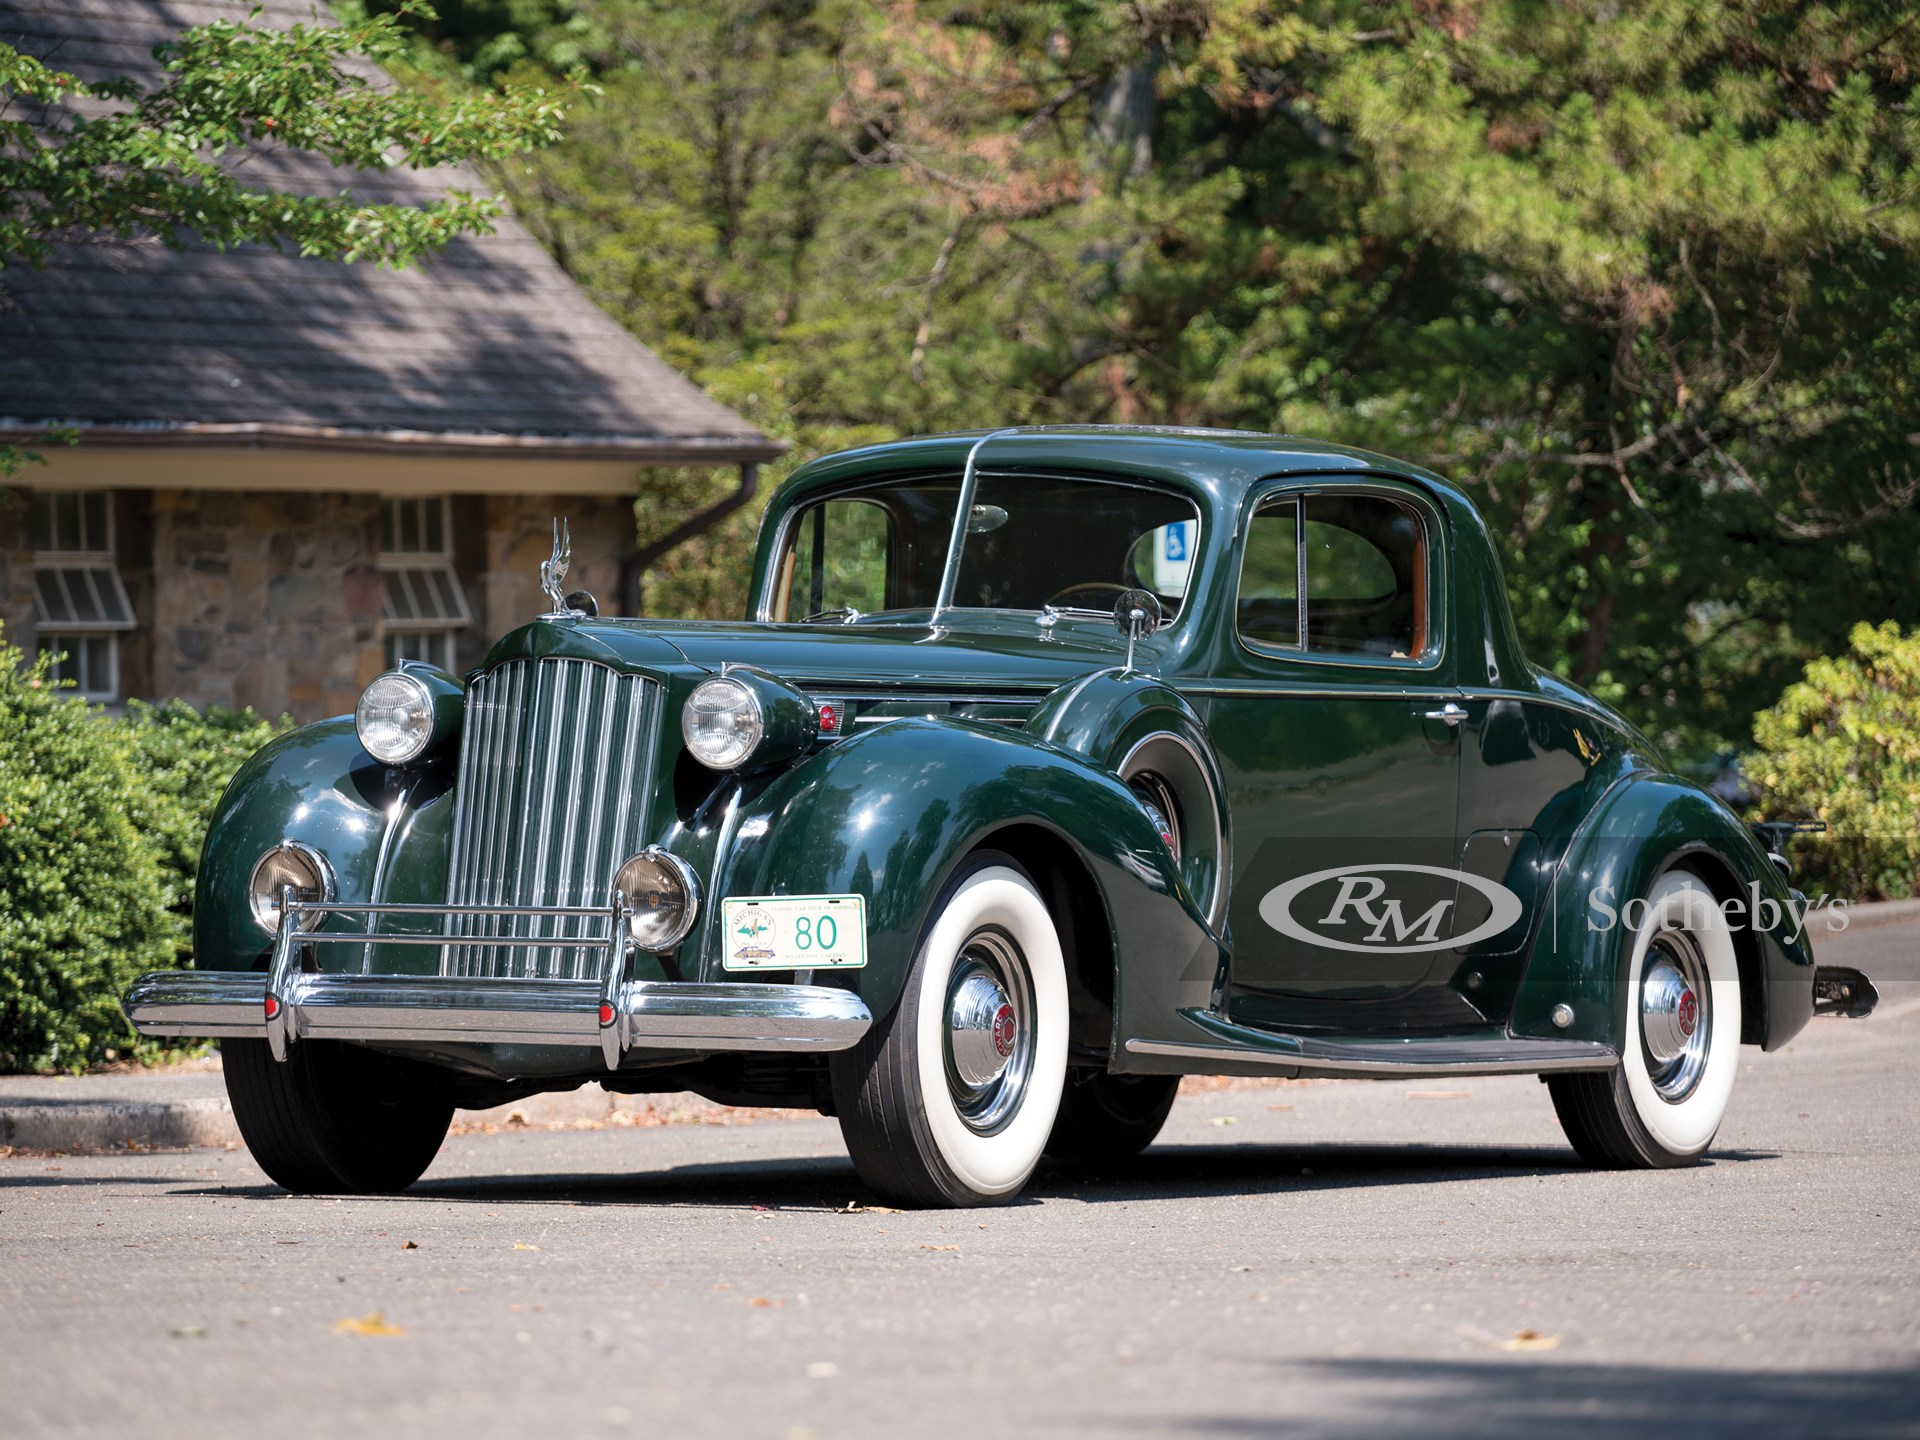 1939 Packard Twelve 2/4-Passenger Coupe